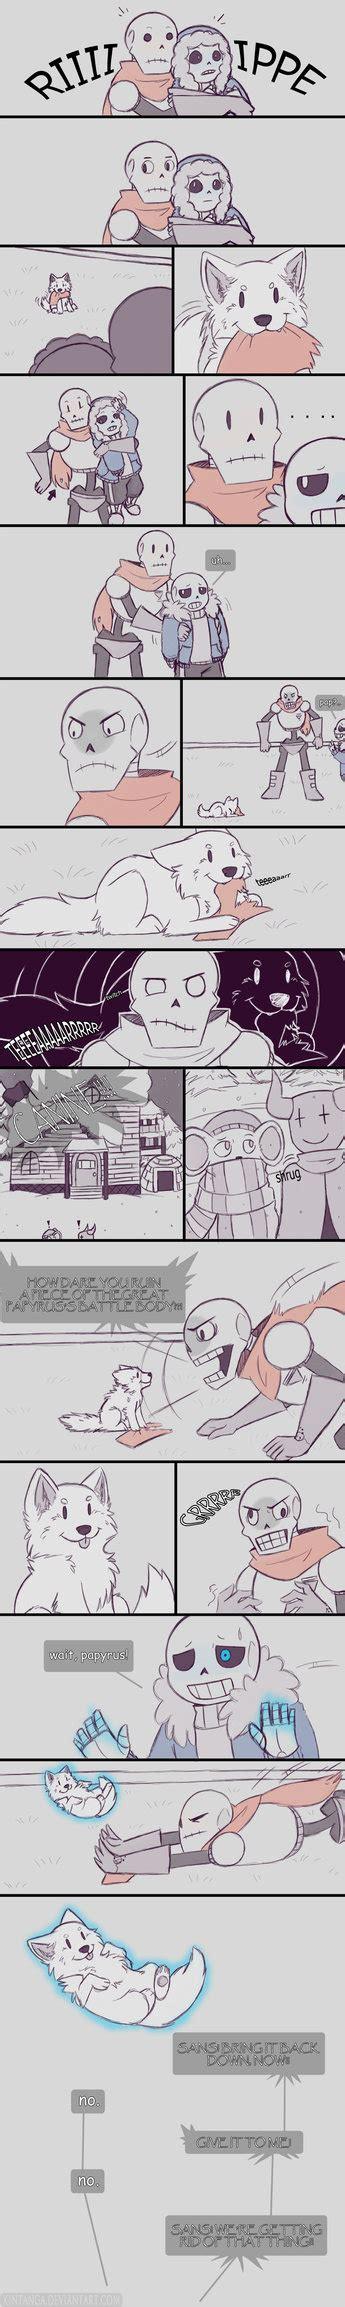 undertale annoying undertale fancomic annoying page 8 by kintanga on deviantart